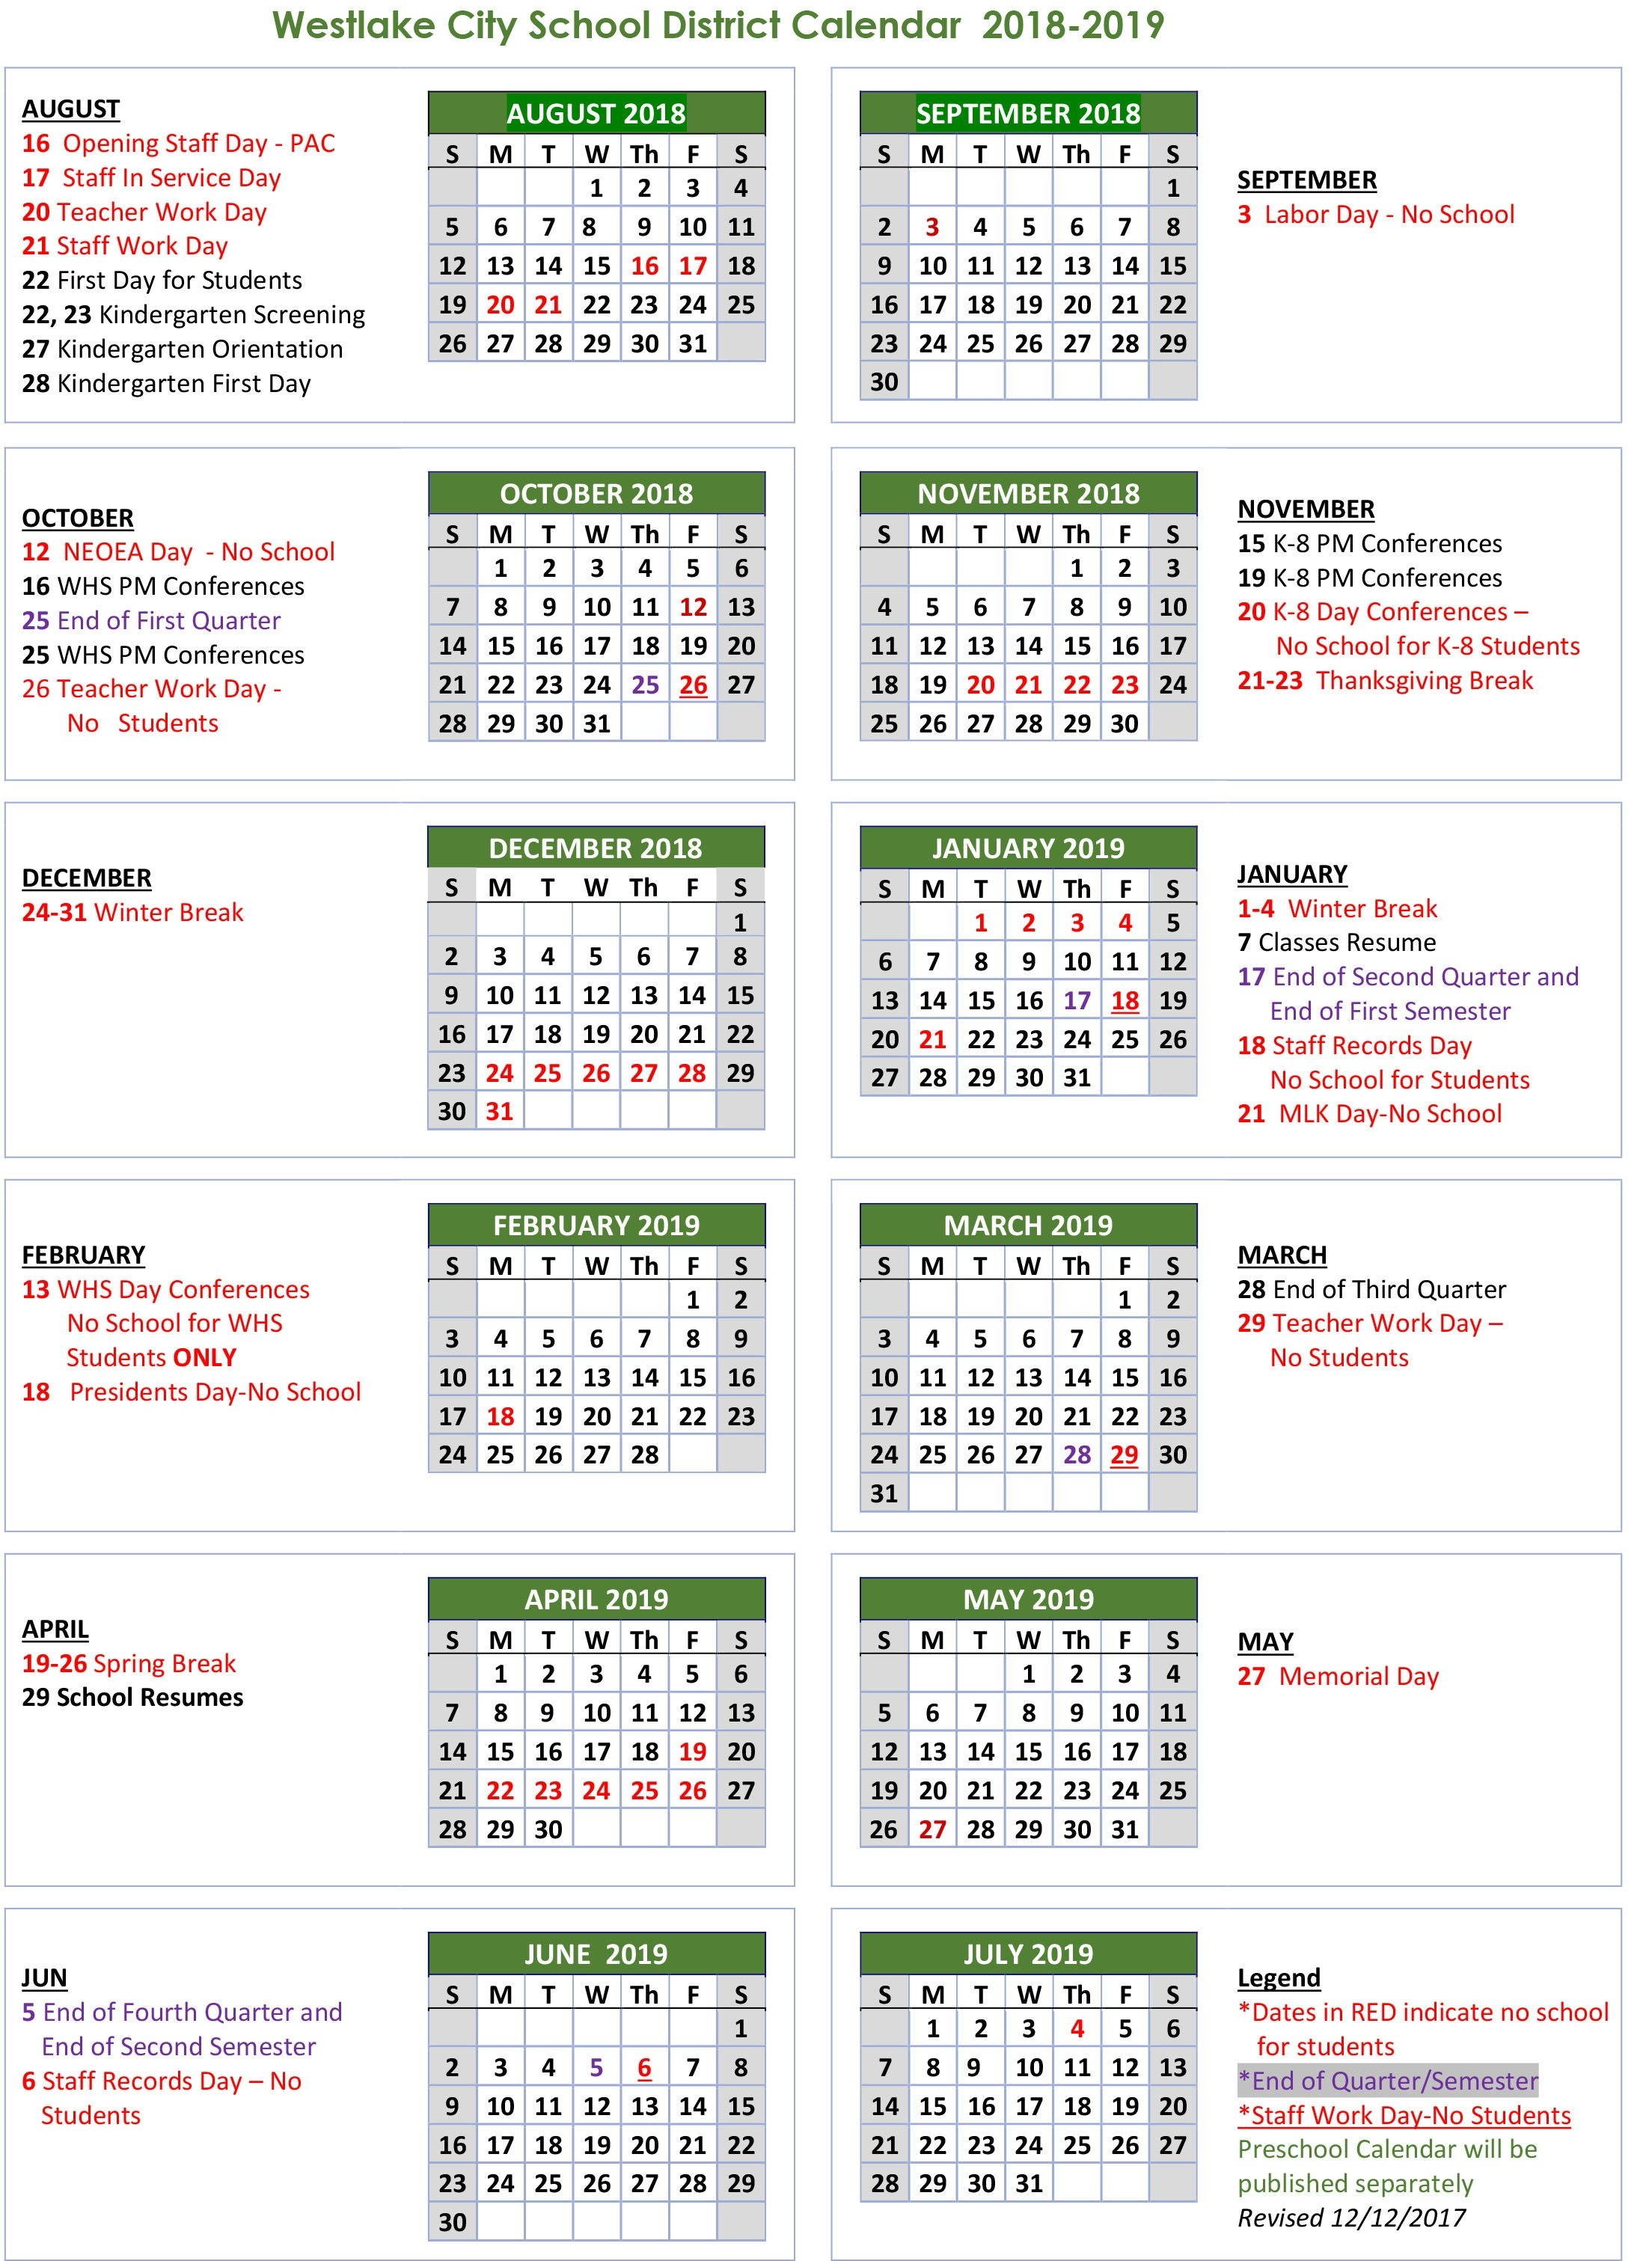 School Calendar - Westlake City School District Unit 5 Calendar 2019